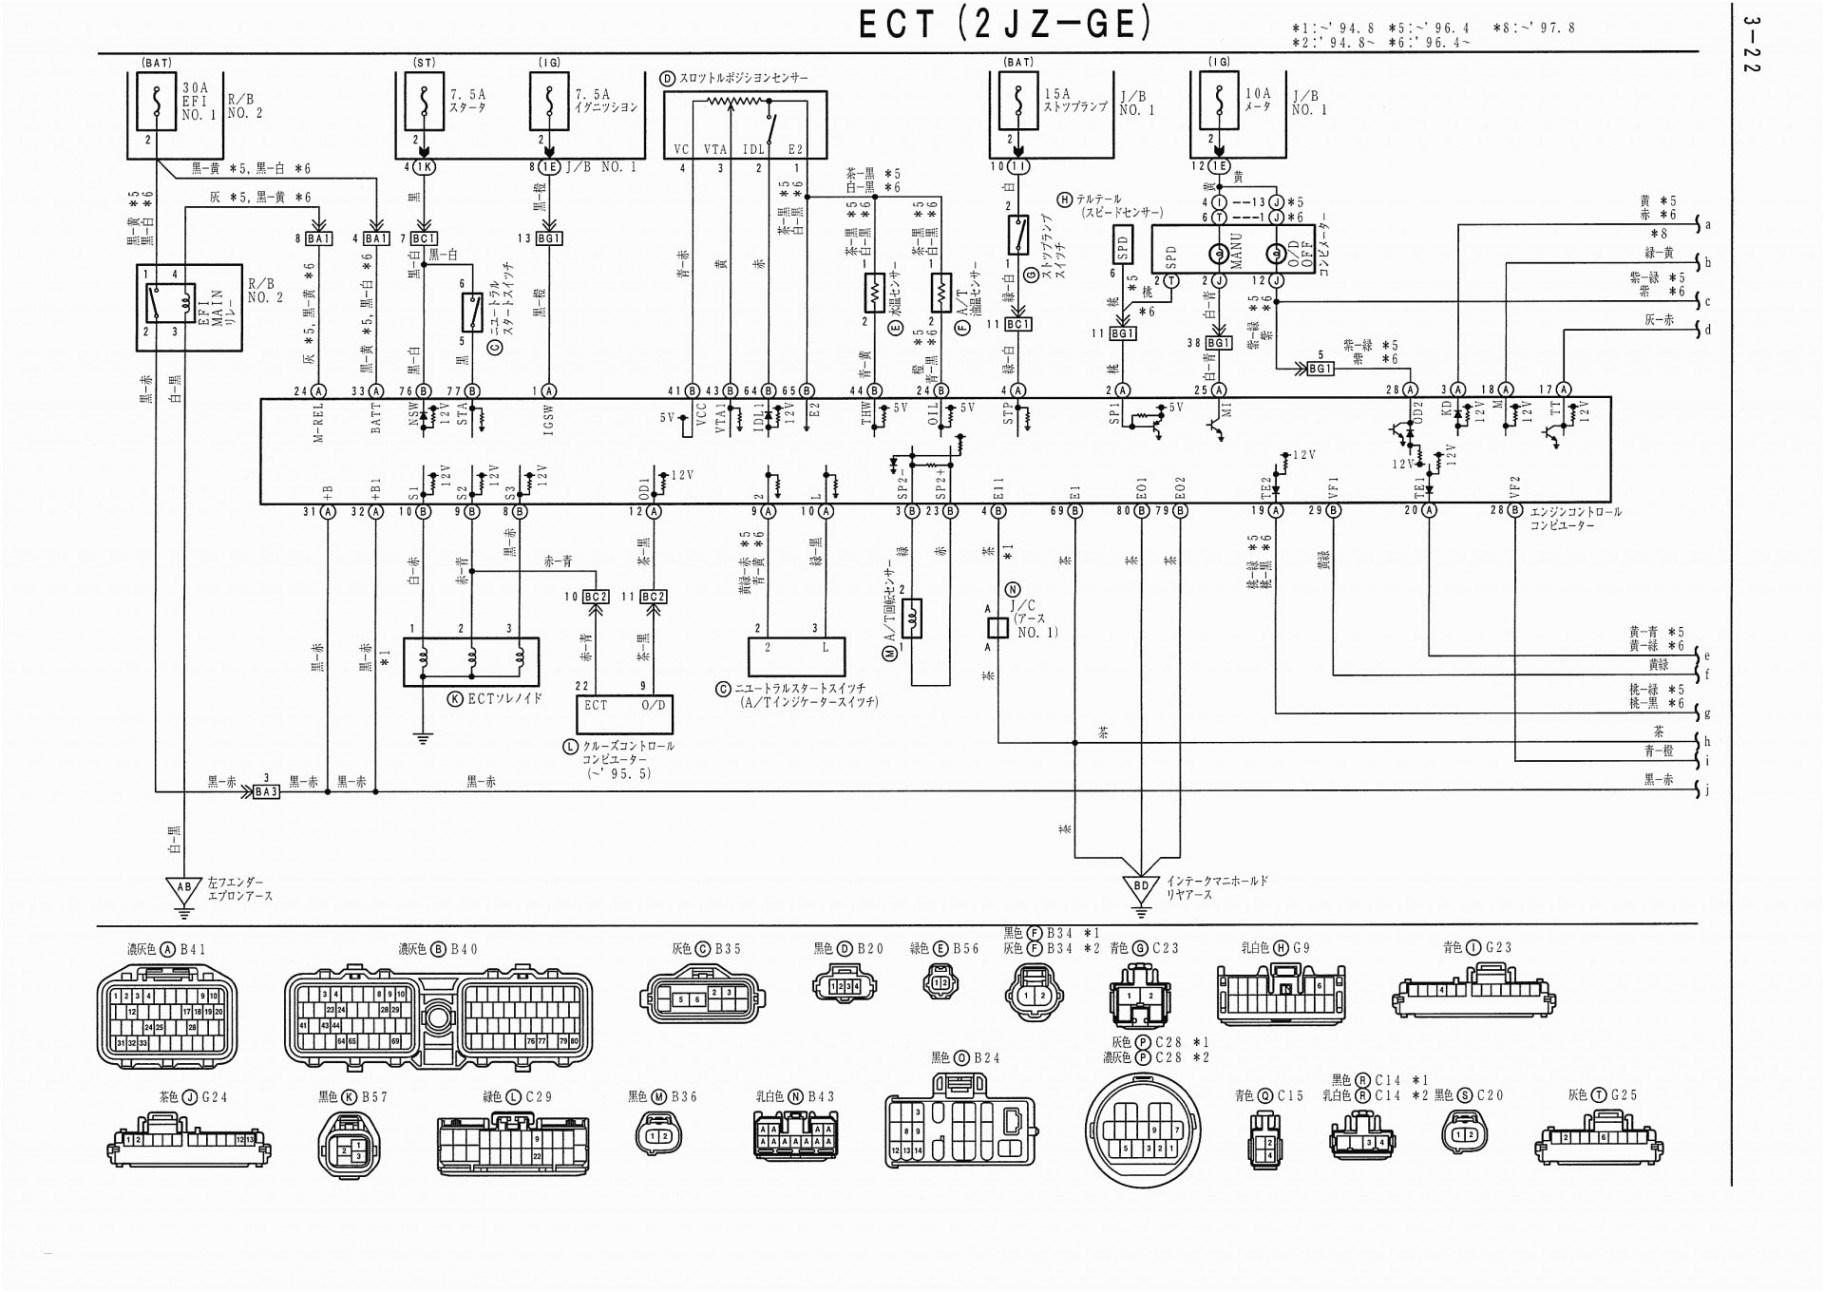 wiring network diagram wiring diagram database diagrams diagram wiring light switch aoa network diagram diagram